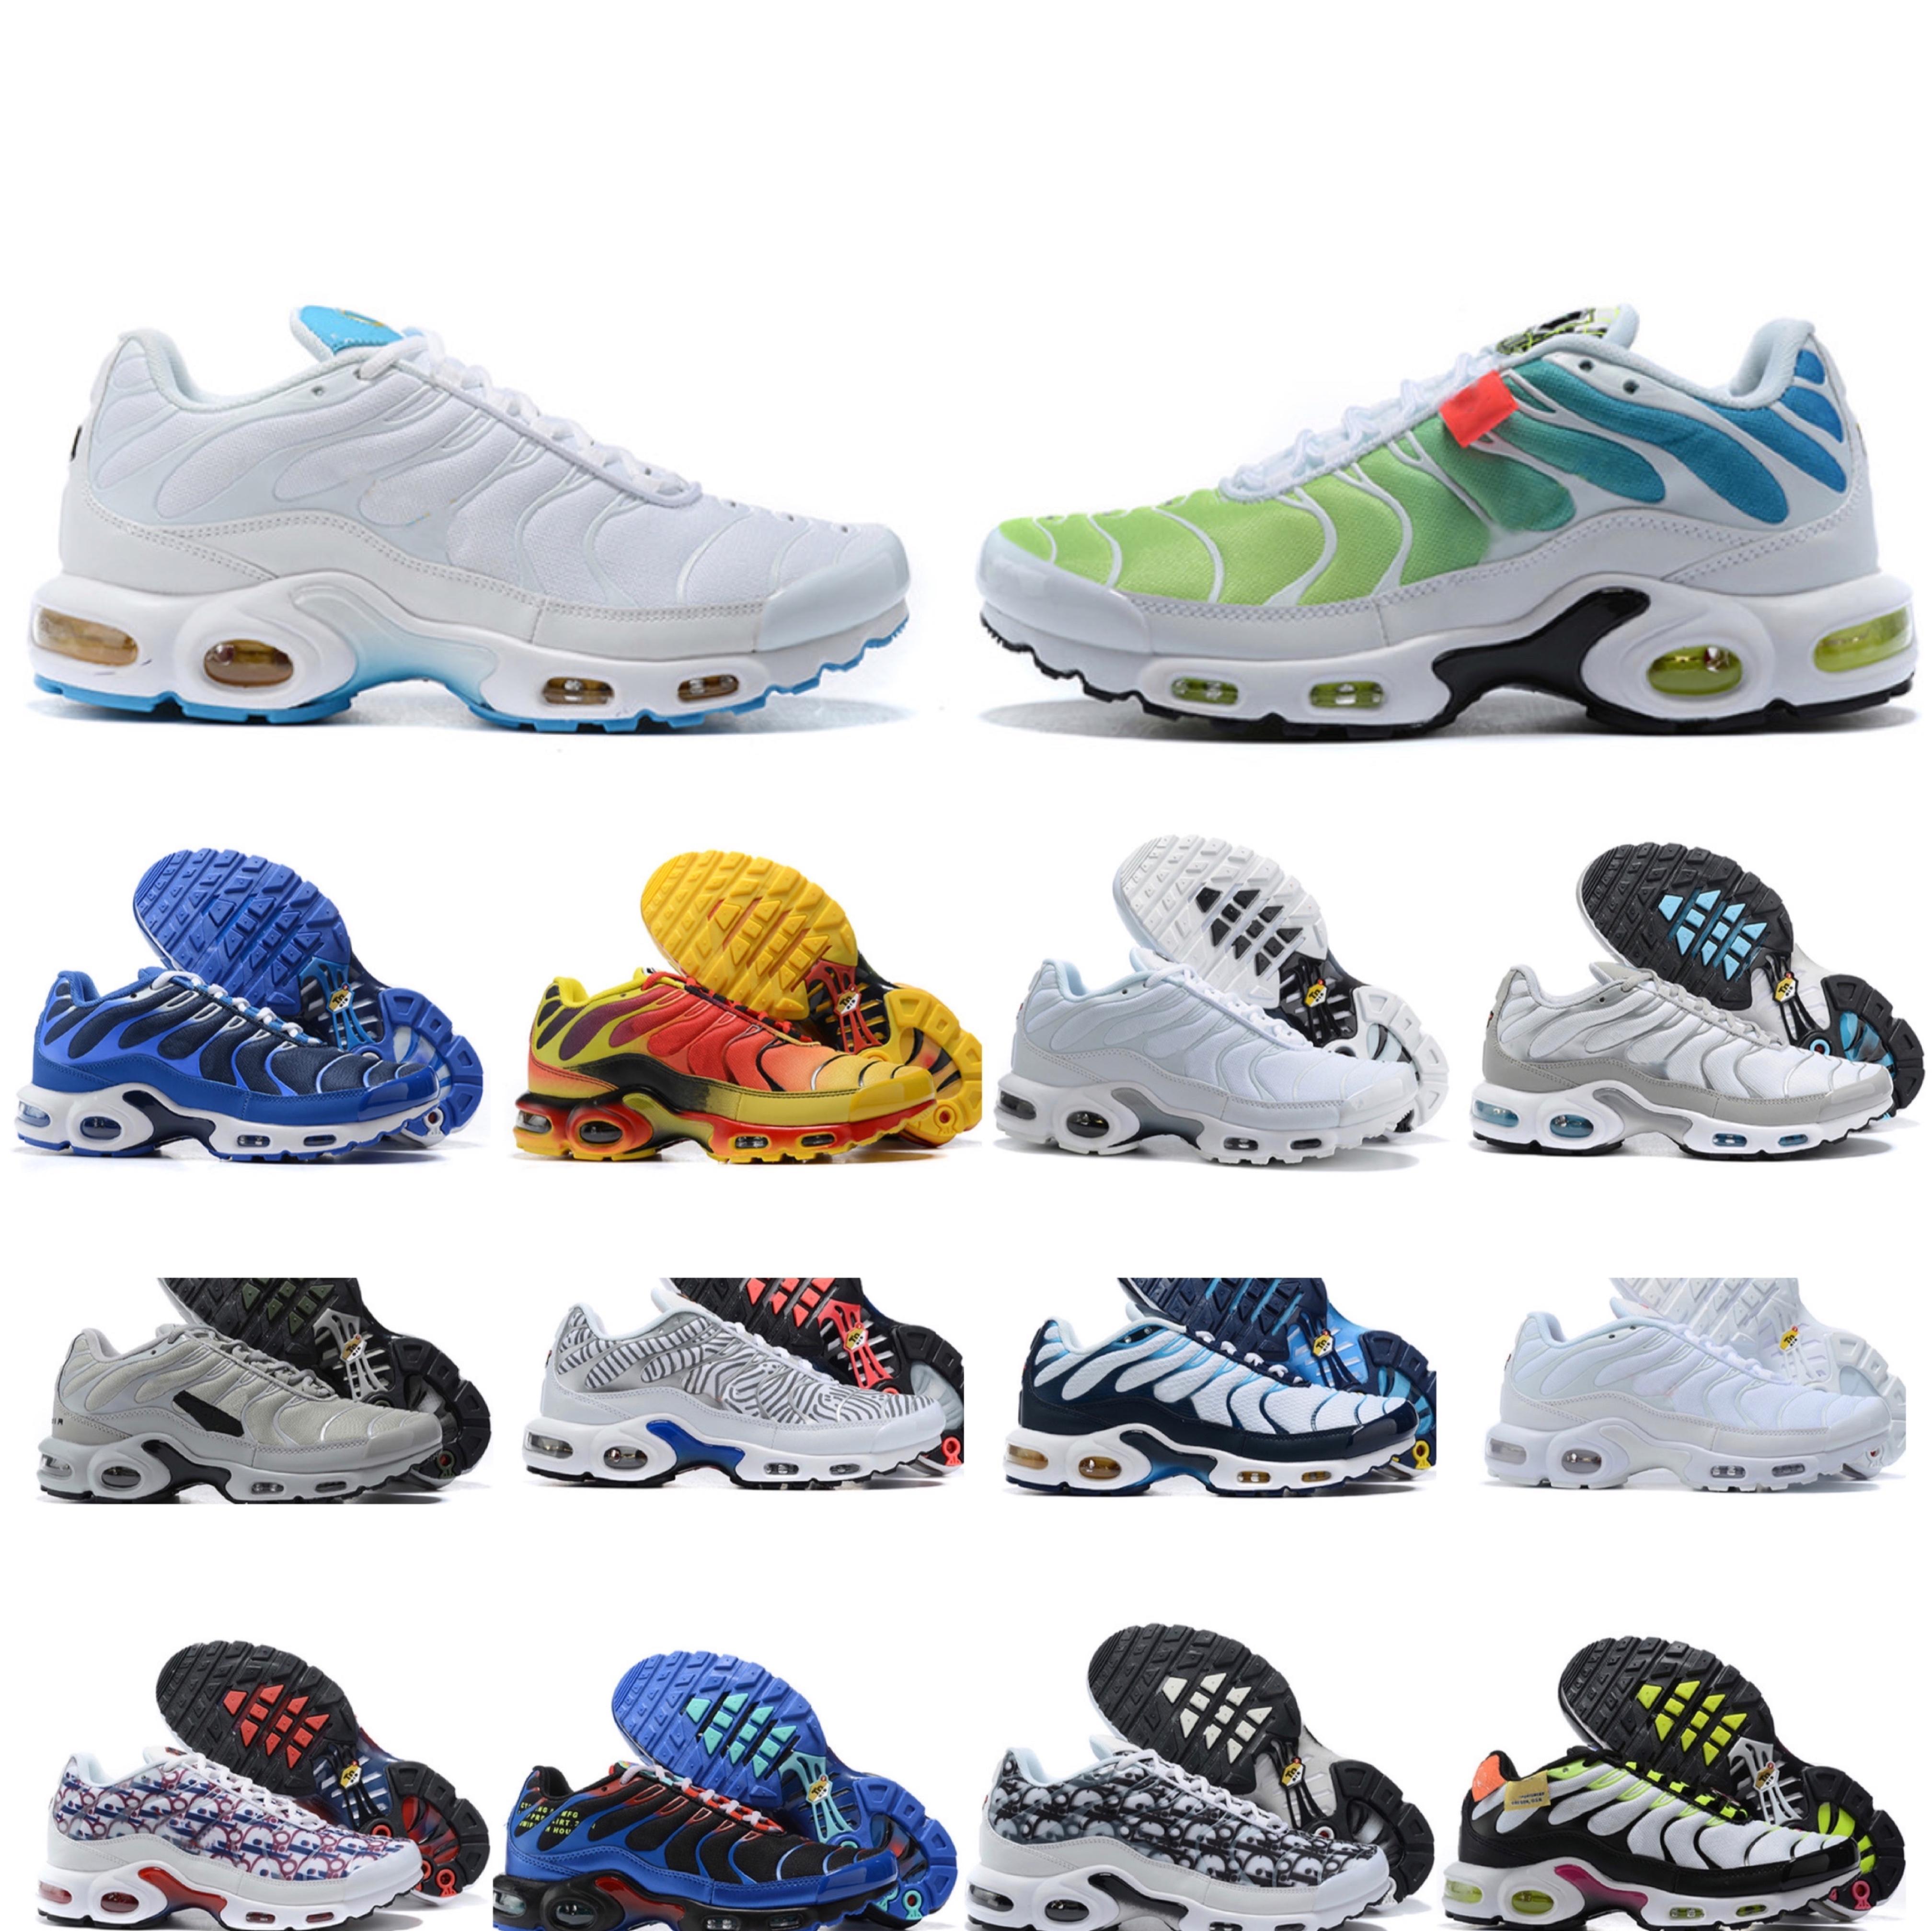 2021NEW Mens TN 플러스 러닝 신발 SE 볼트 블랙 하이퍼 블루 오레오 보라색 운동화 TNS 클래식 야외 트레이너 크기 40-46